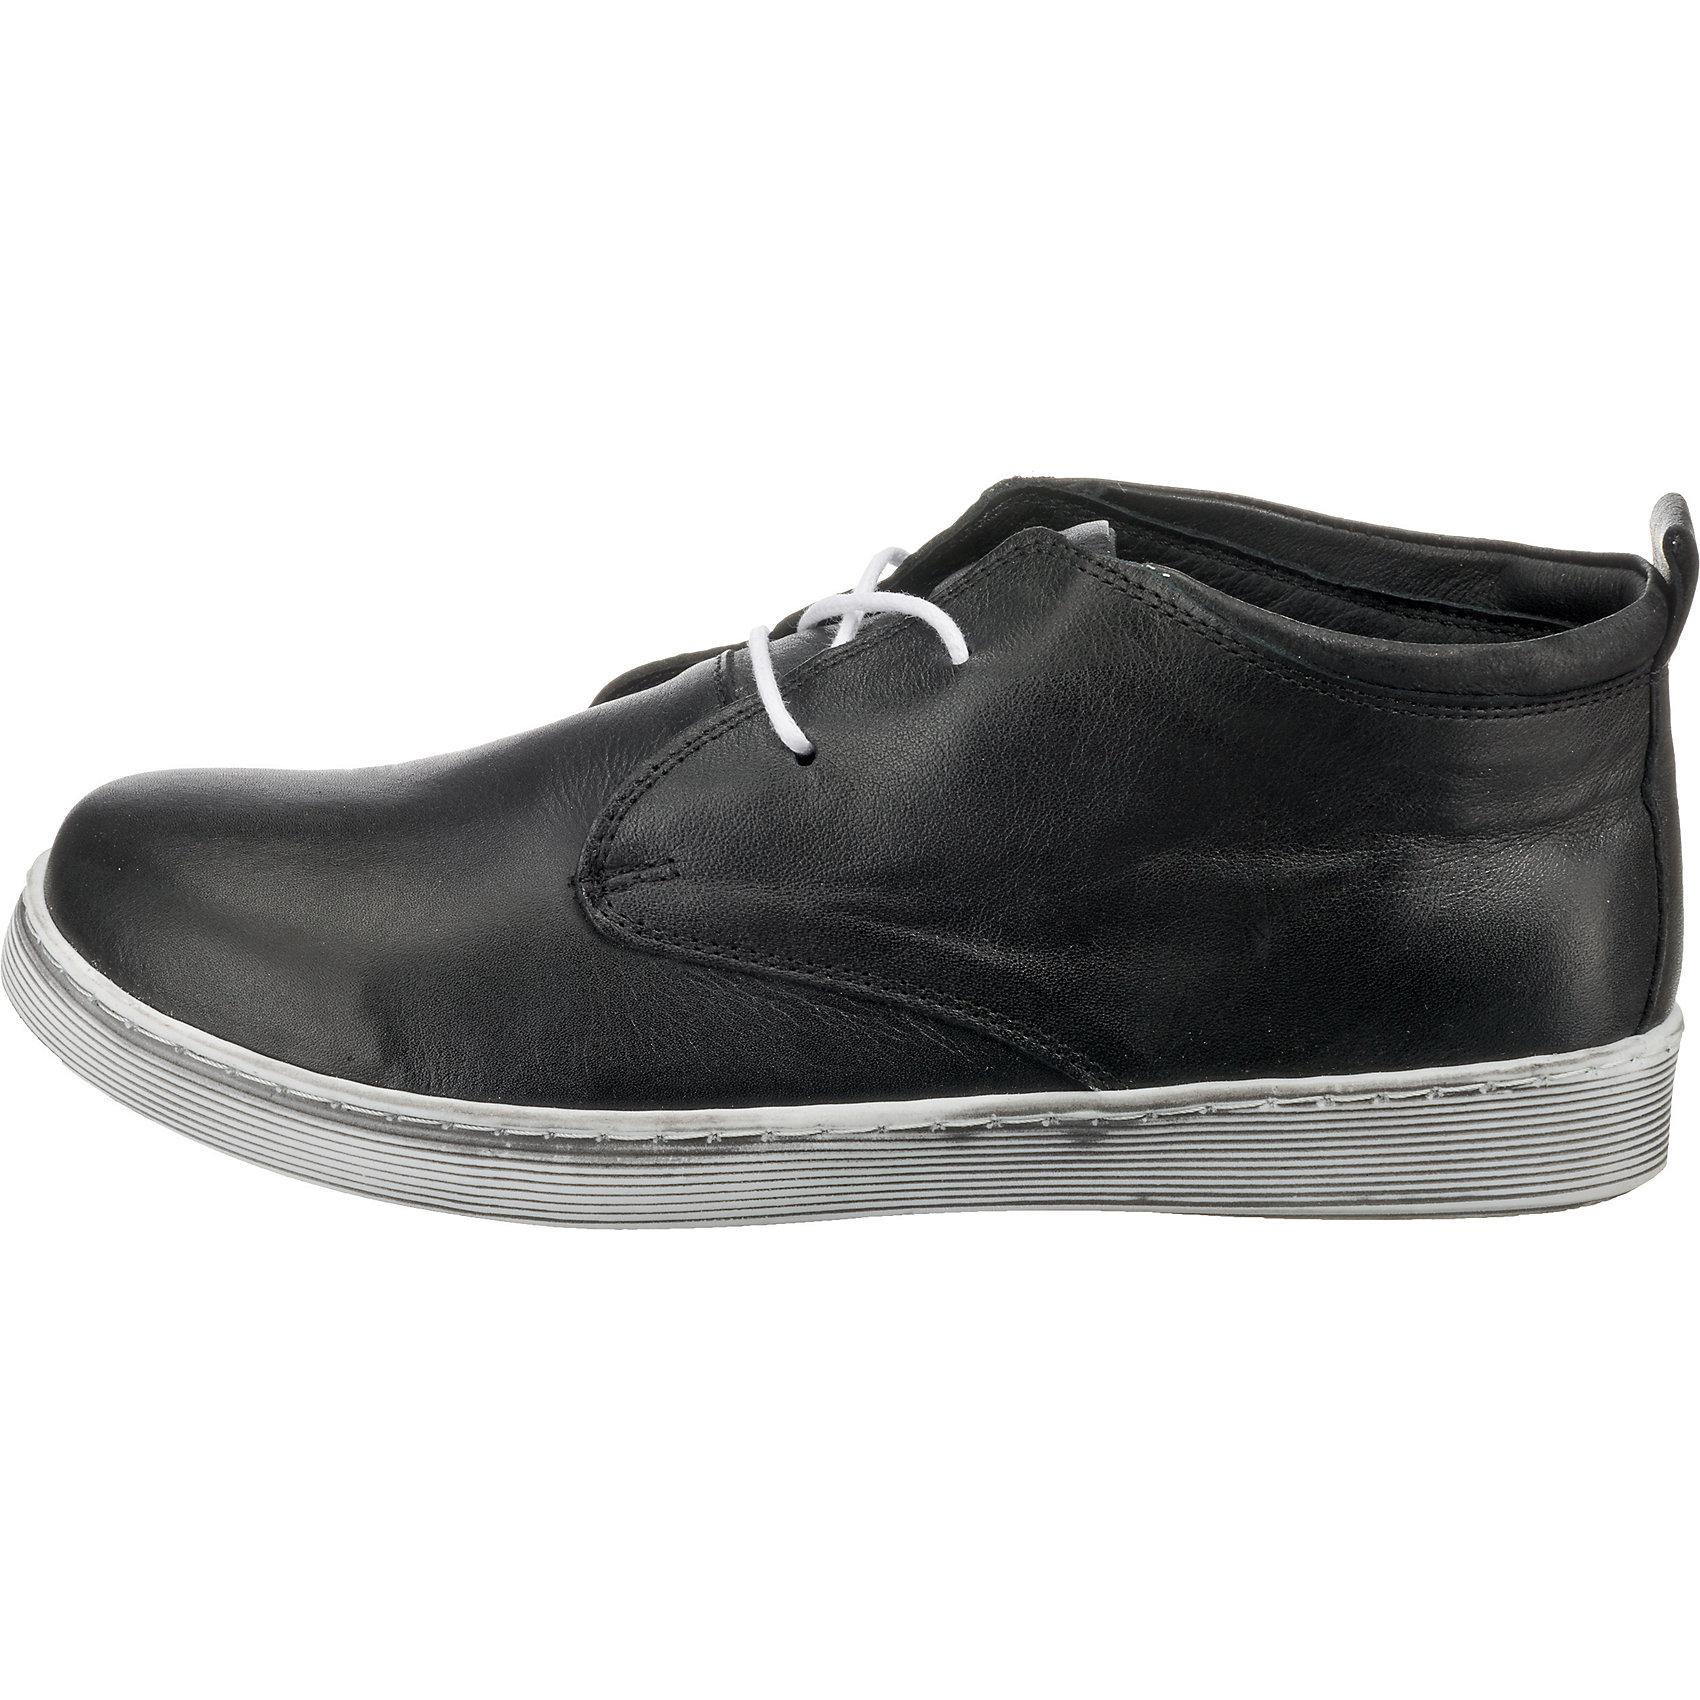 Neu Andrea Conti Klassische Damen Stiefeletten 7569344 für Damen Klassische schwarz 860c6f